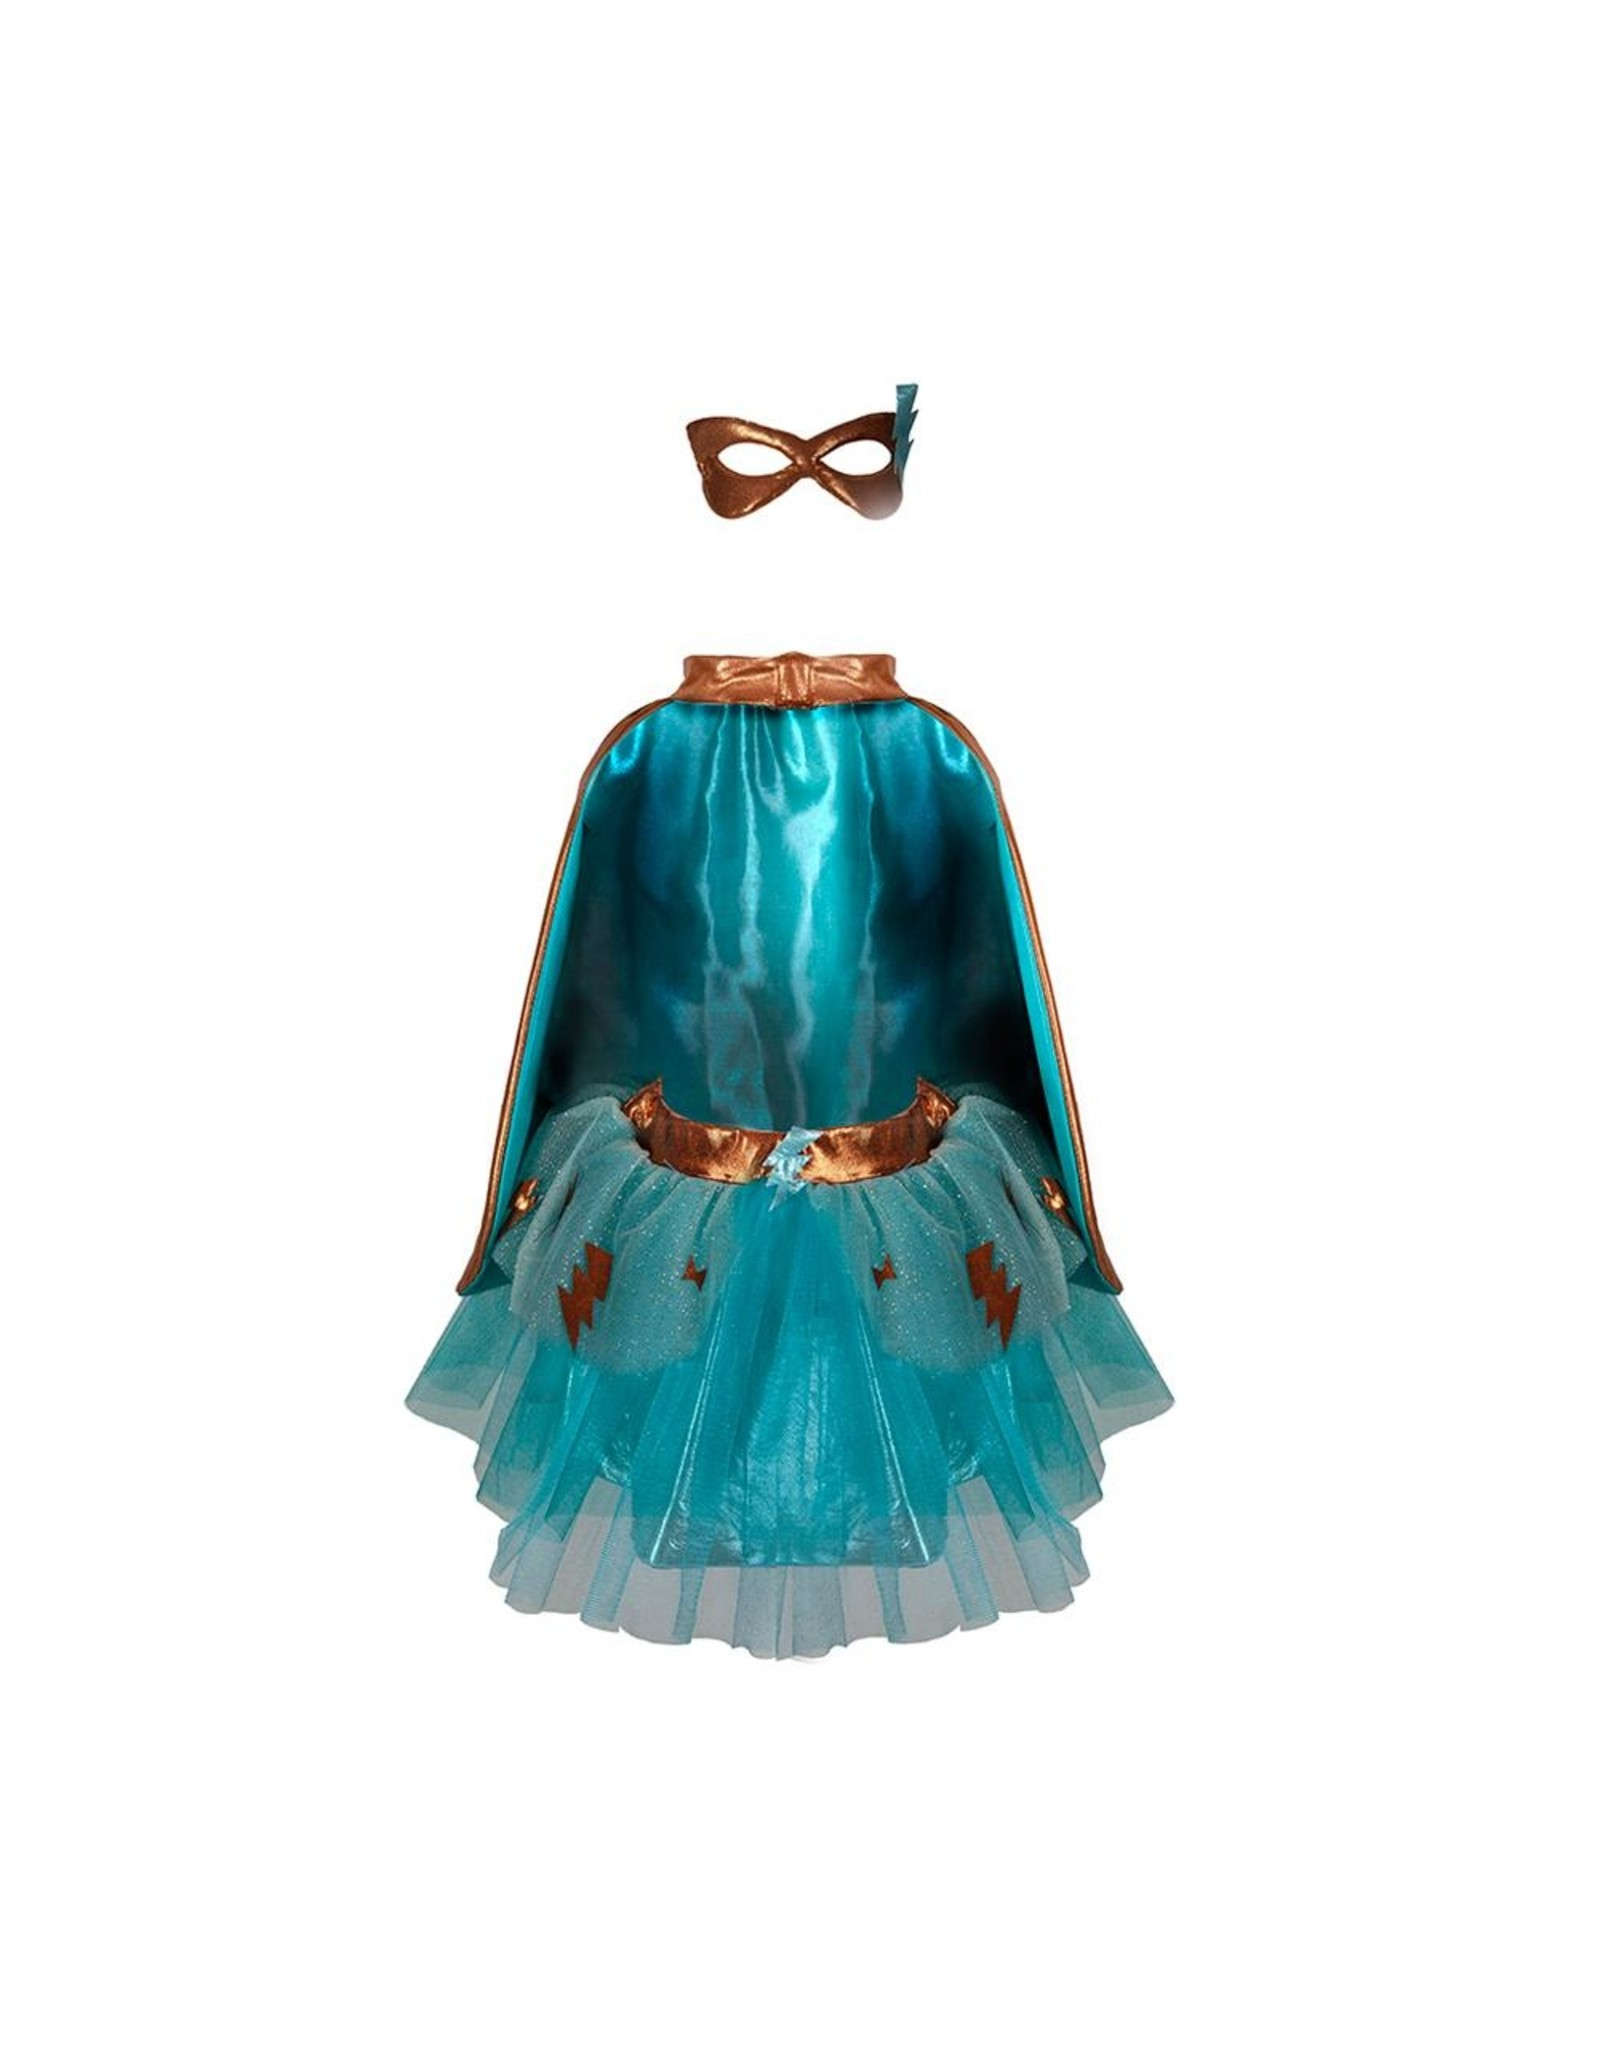 Great Pretenders Super-Duper Tutu/Cape/Mask Turquoise/Copper  Size 4-6